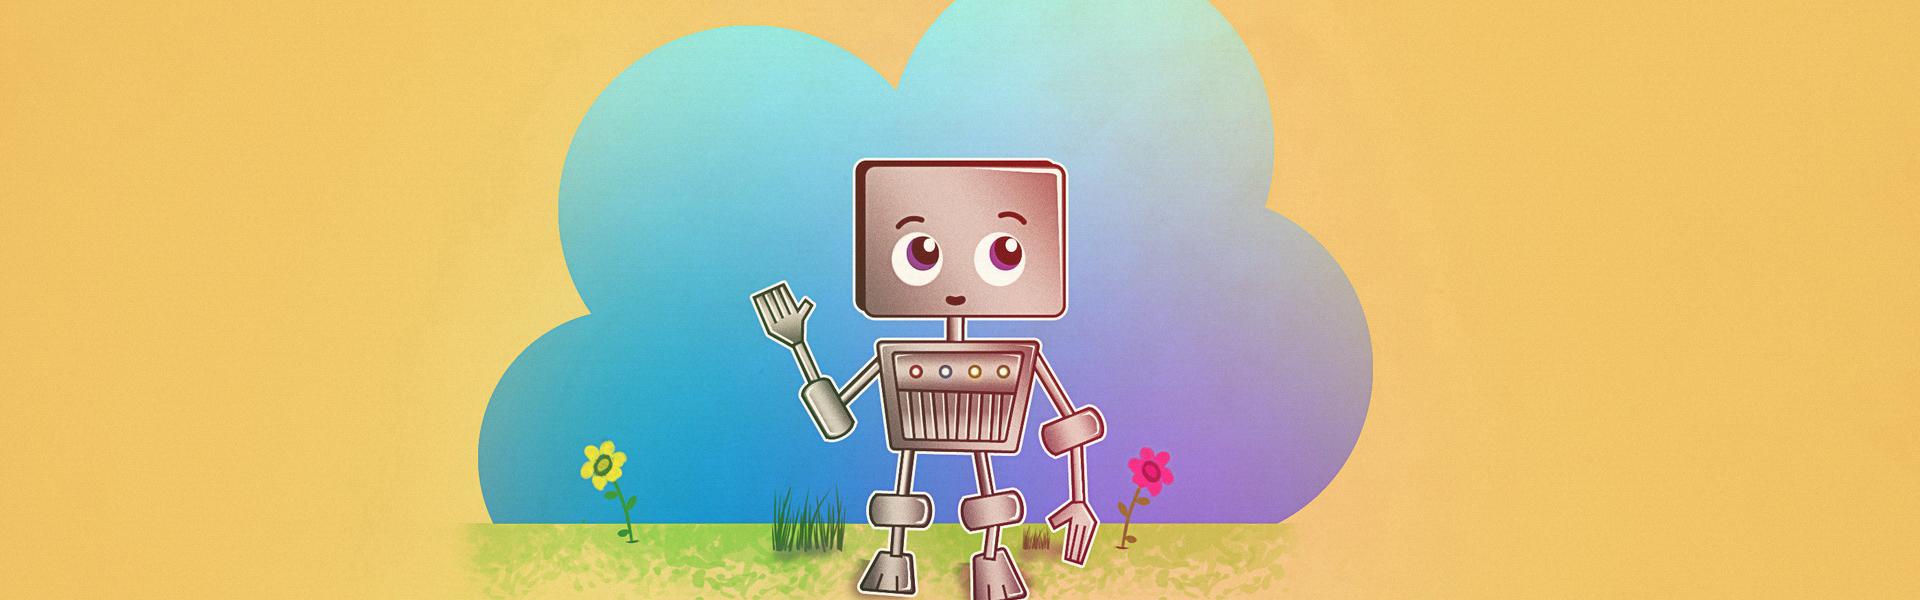 Robot di cartone a sfondo giallo i cartoni animati robot il